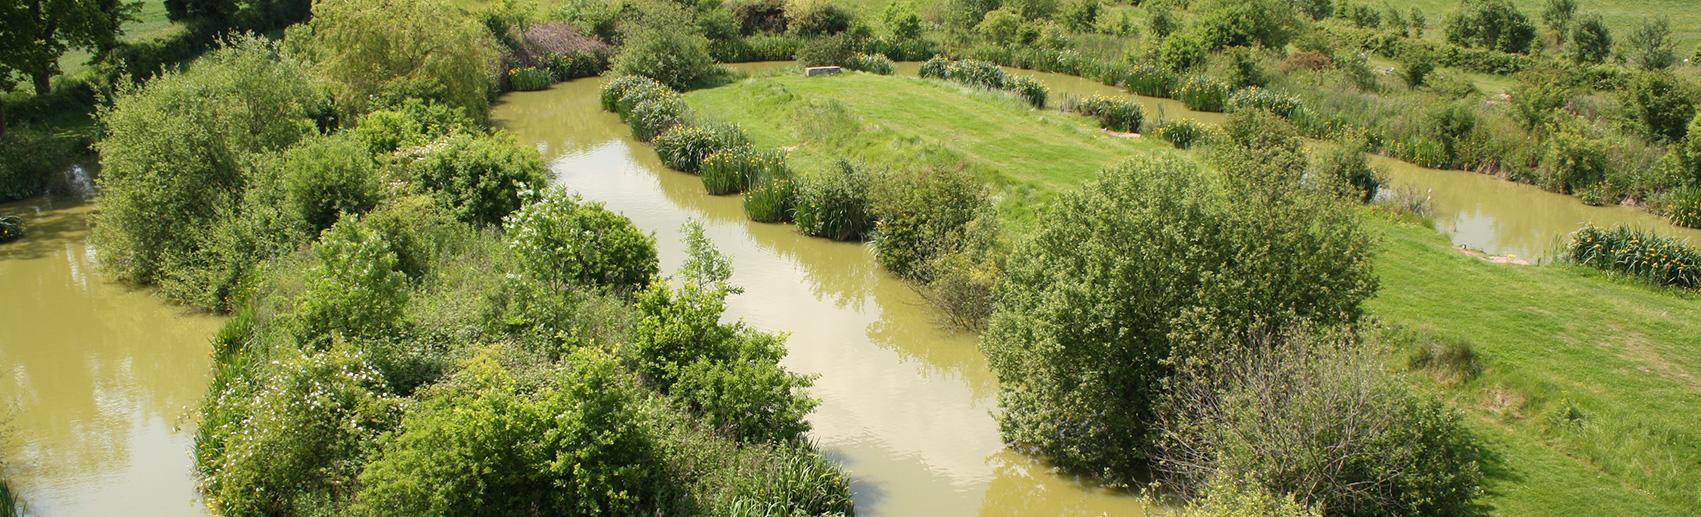 snake fishing lake - newdigate farms estate